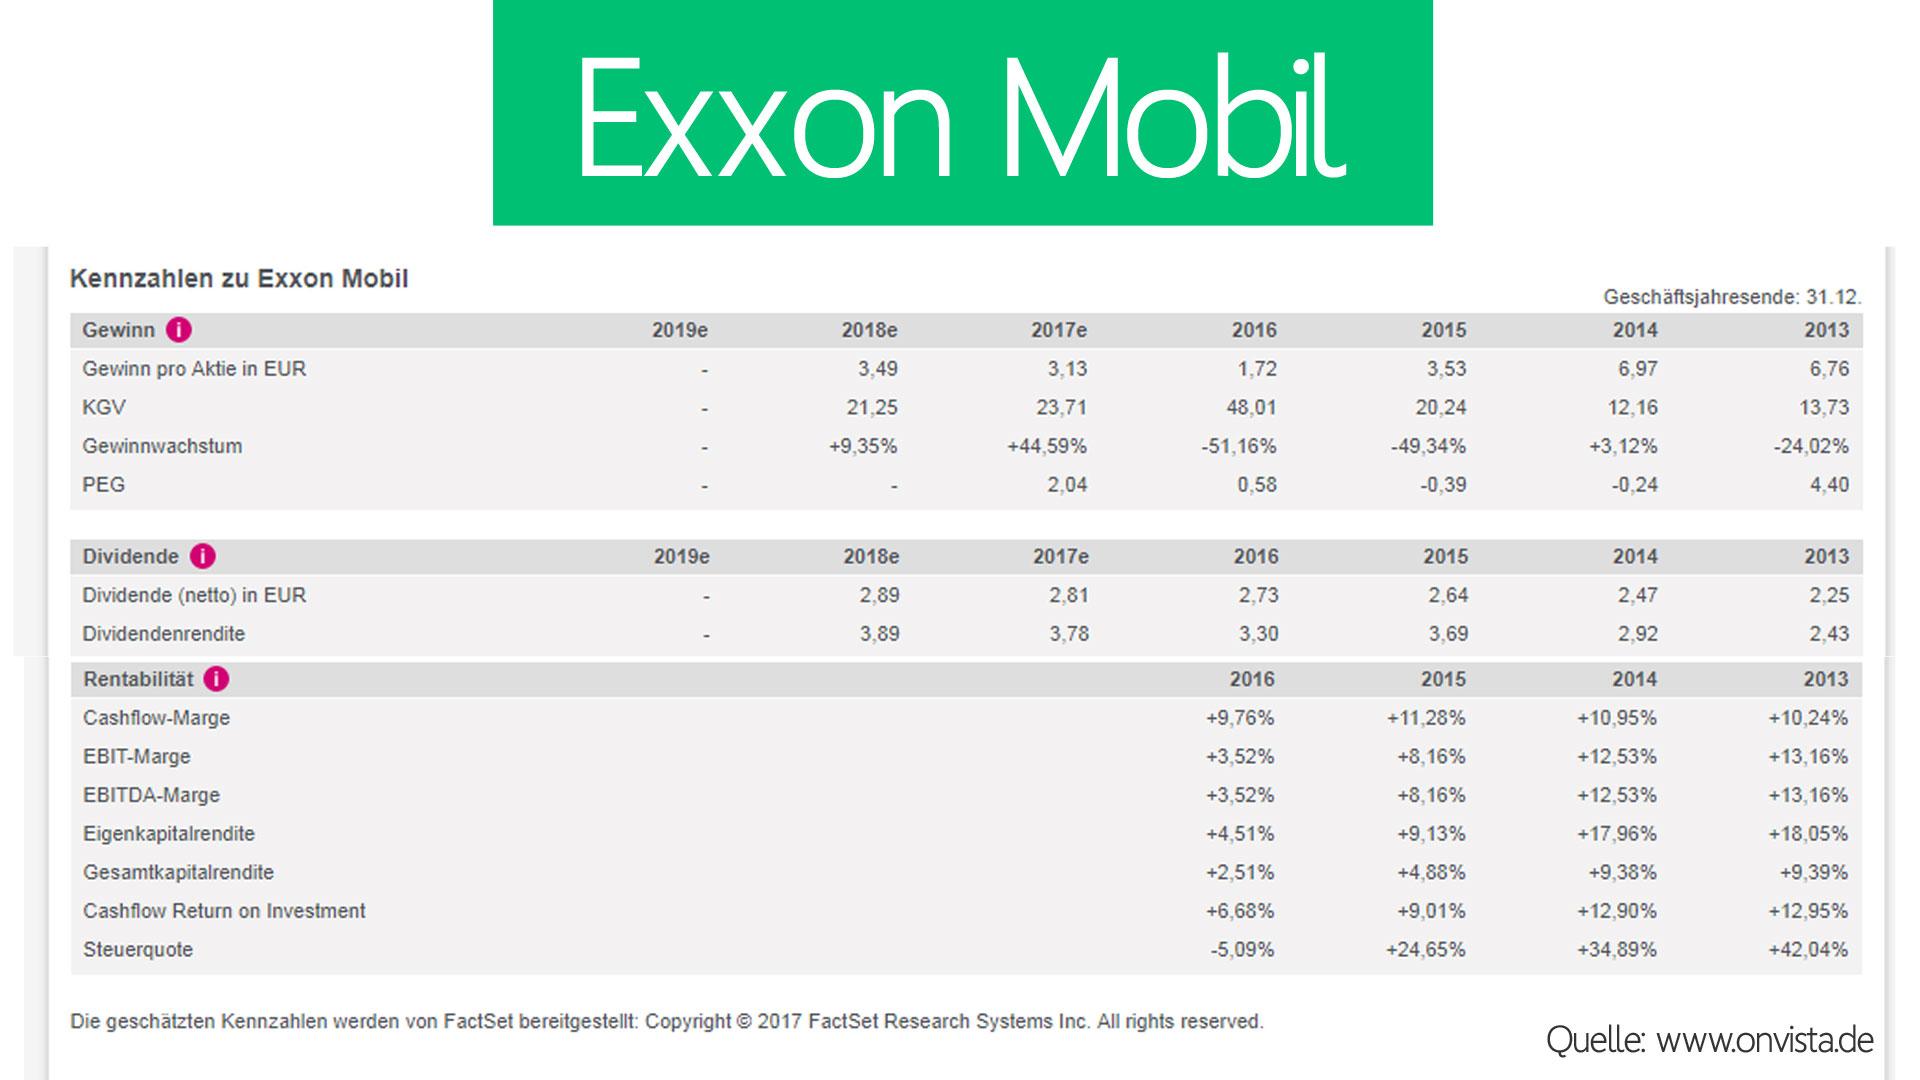 kennzahlen-exxon.jpg